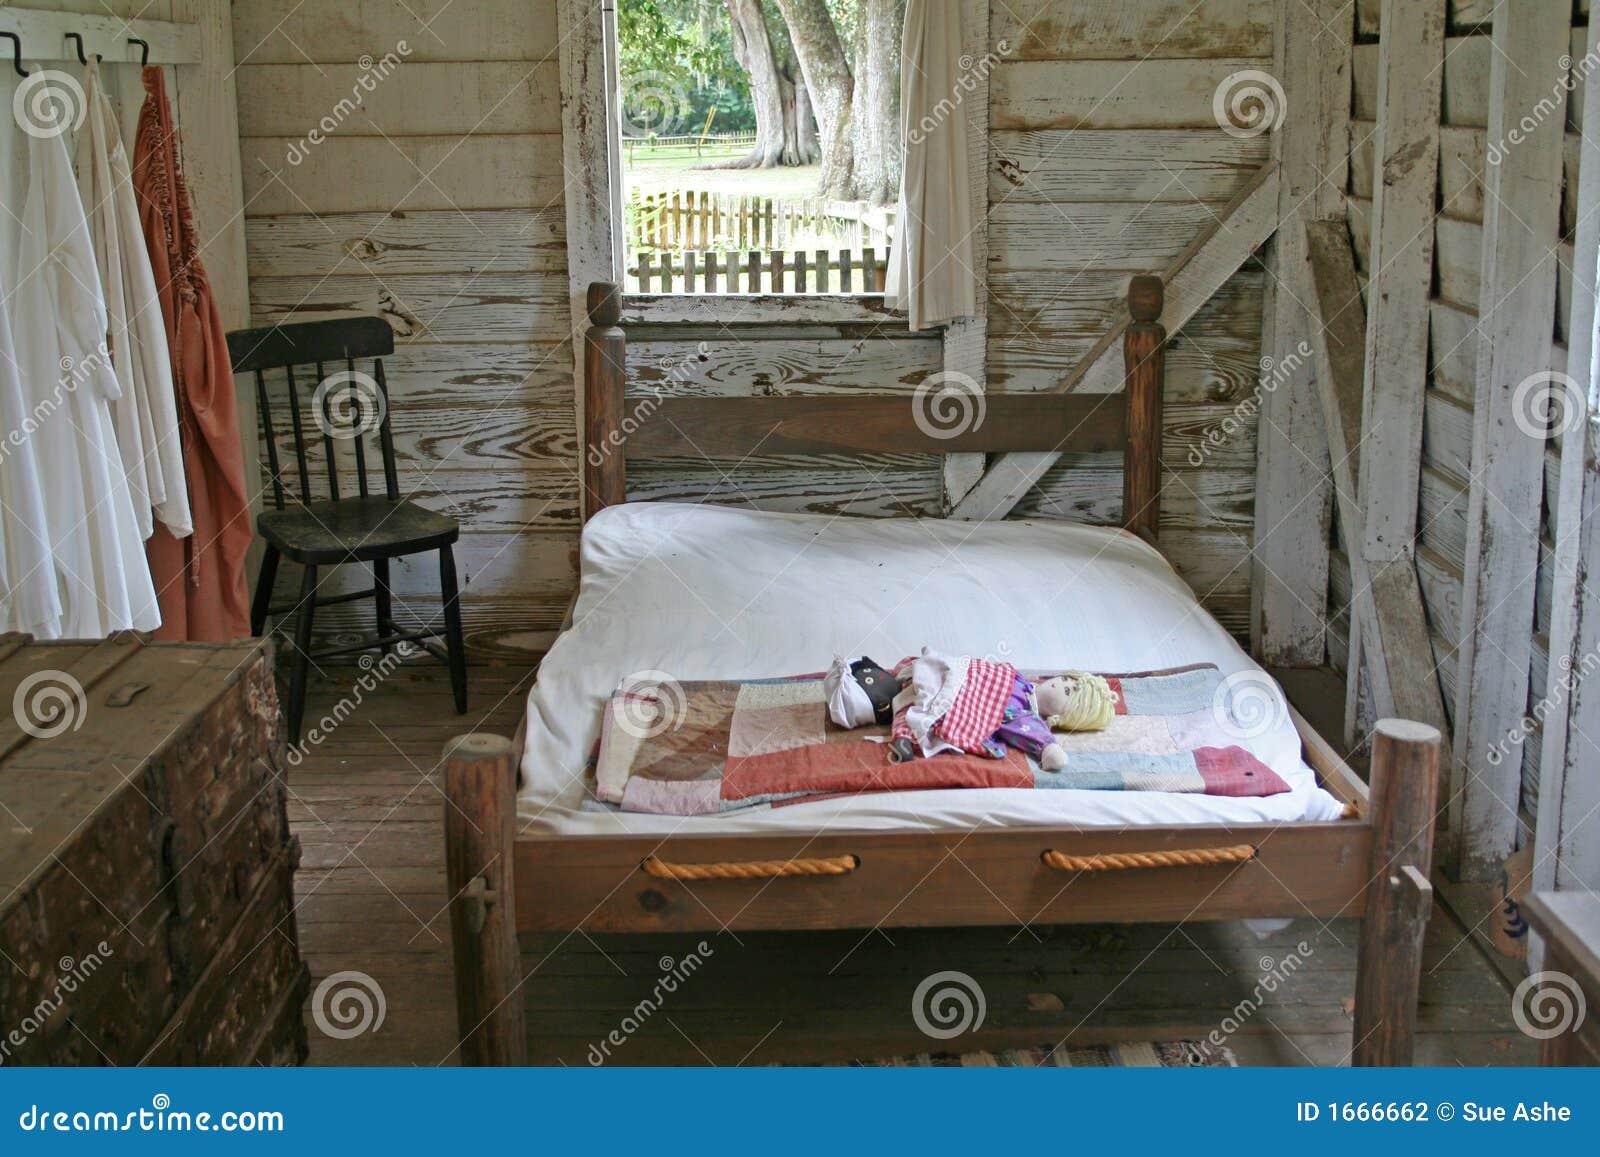 Primitive Bedroom Stock Photography Image 1666662